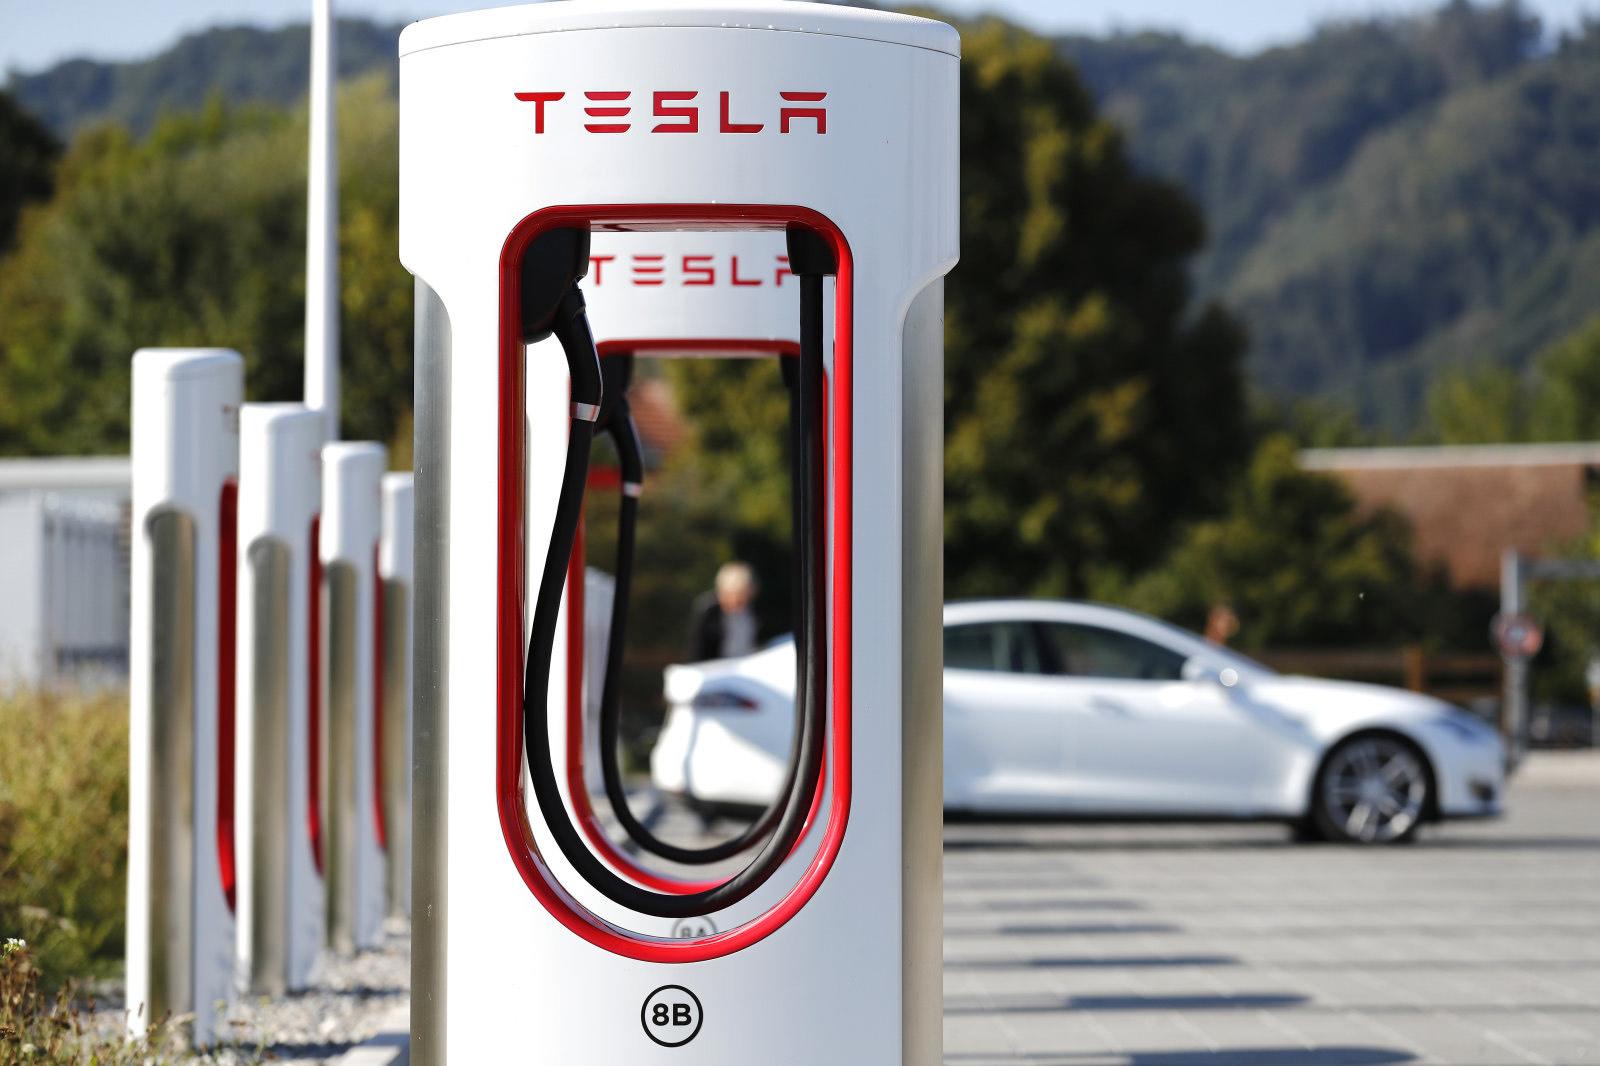 Kostenlos an V3 Superchargern laden [CCS außer Tesla)